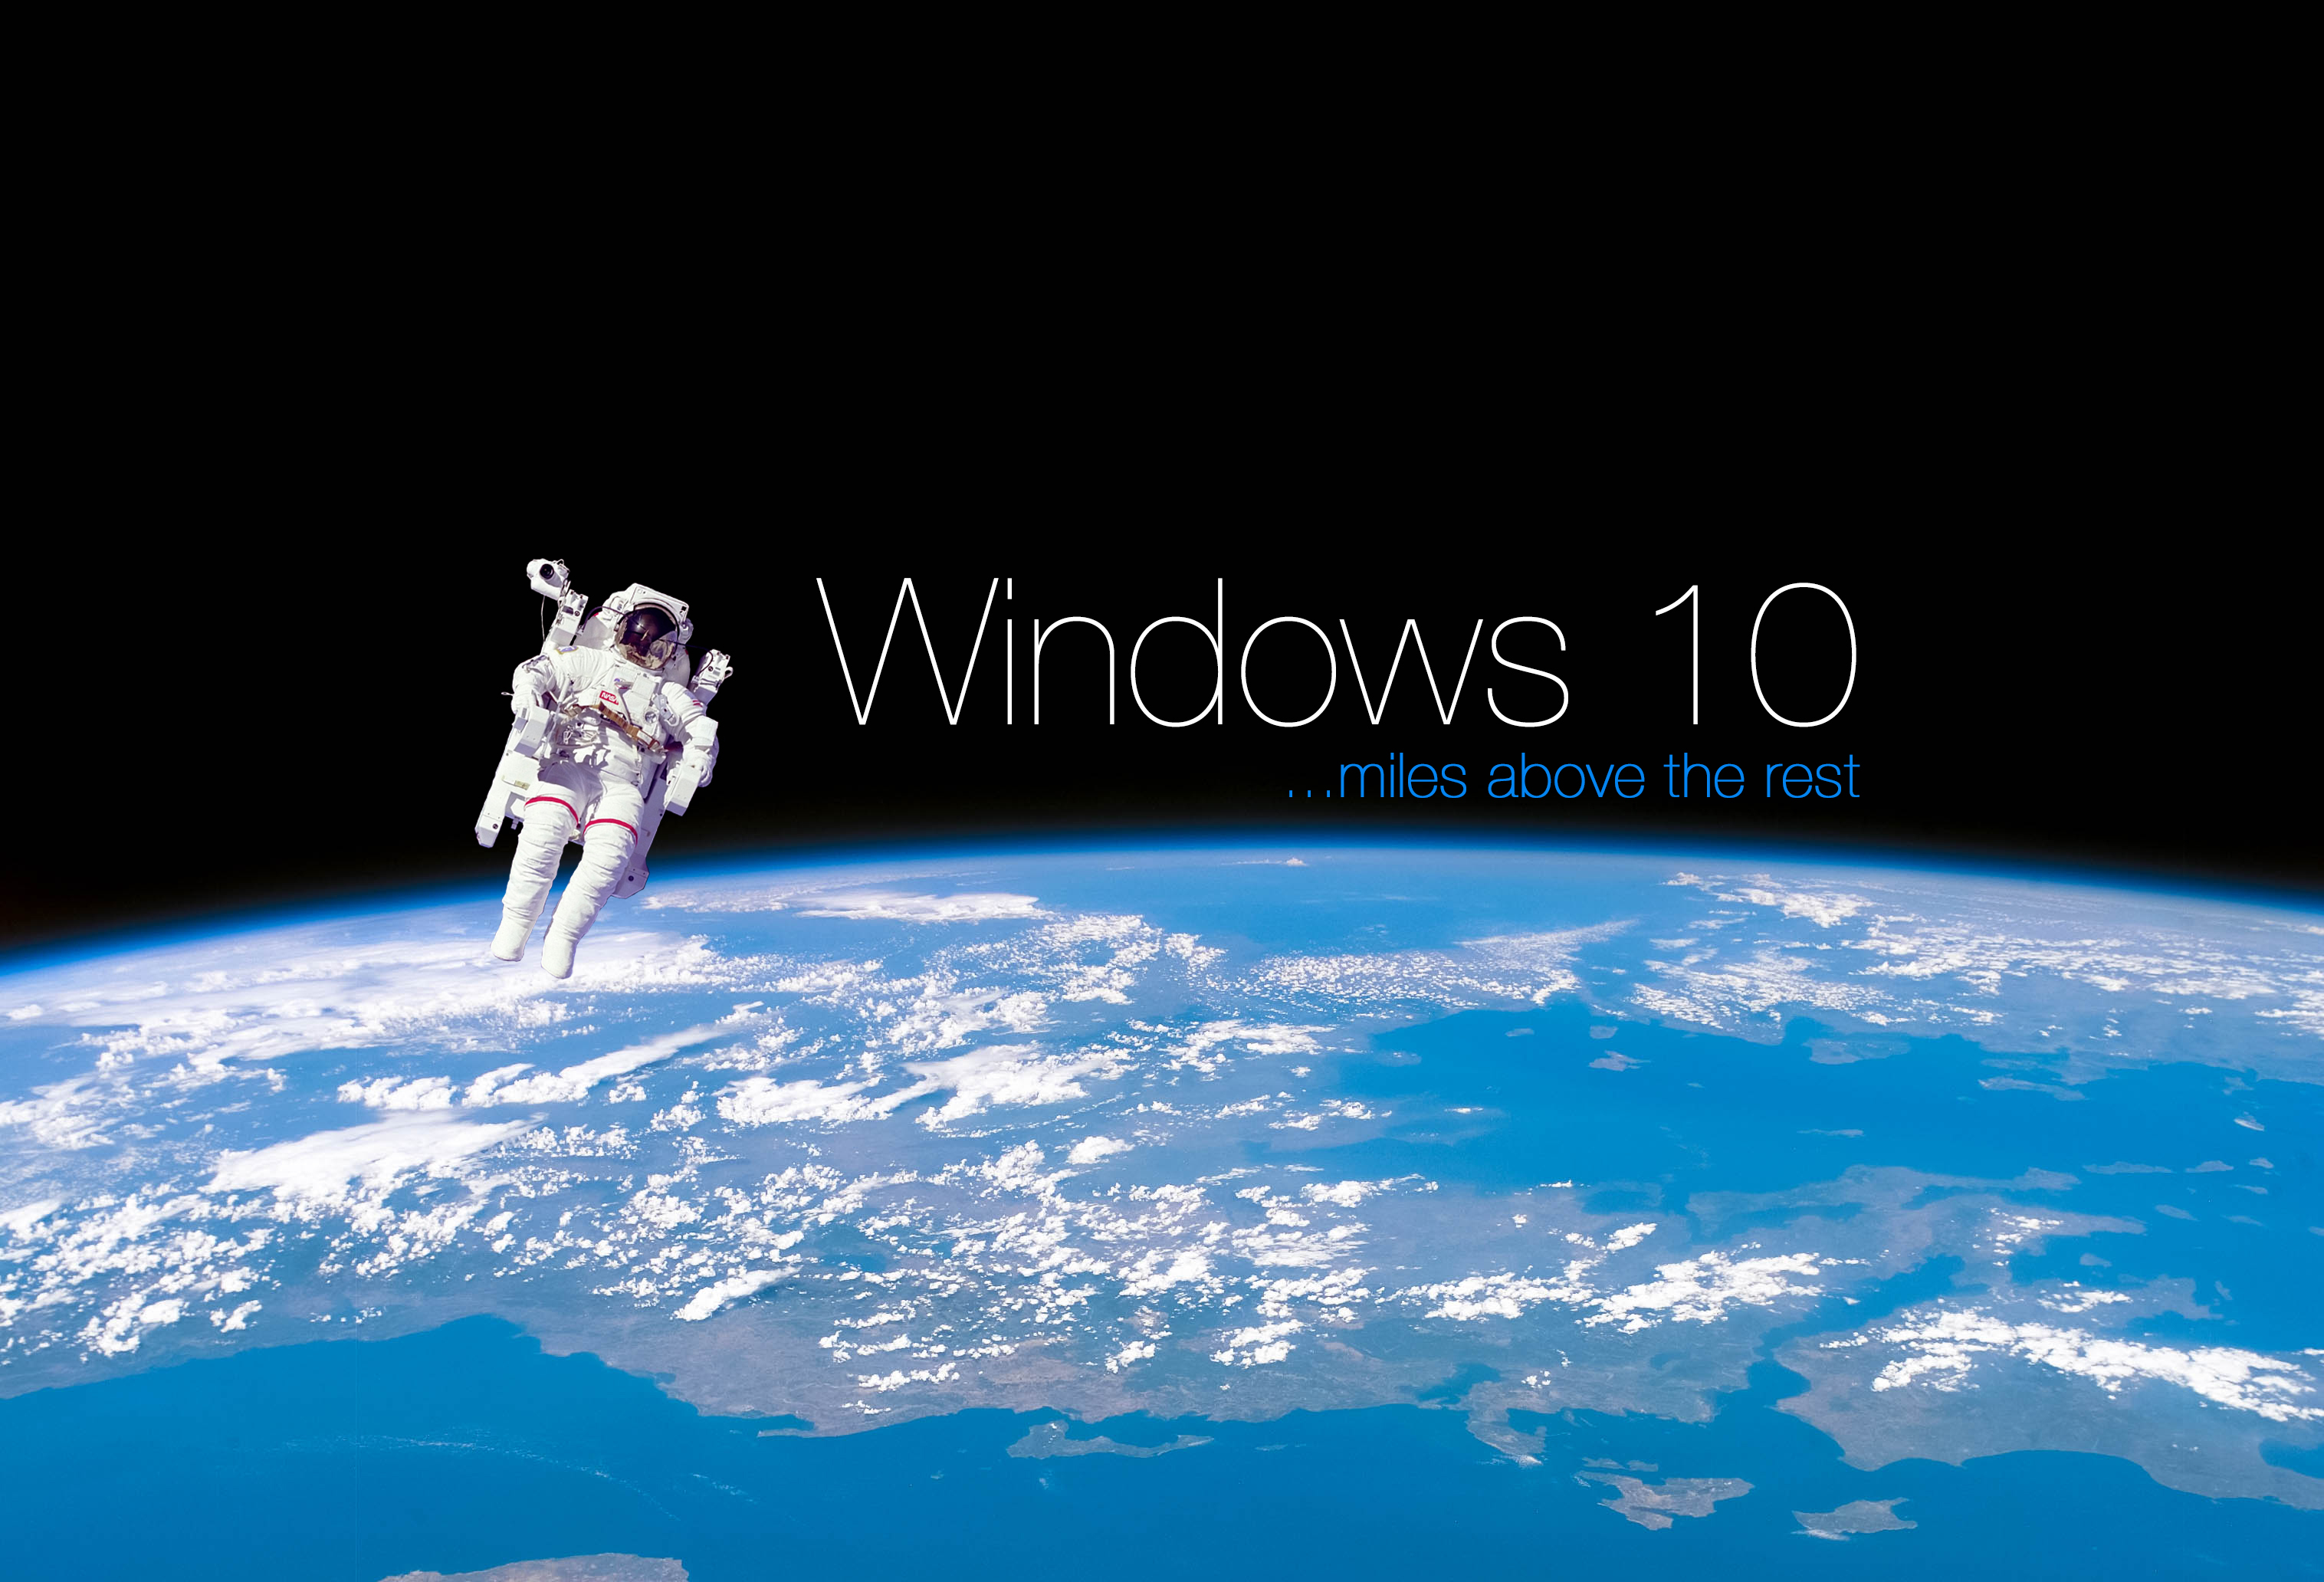 windows 10 wallpaper hd news gazenews gaze